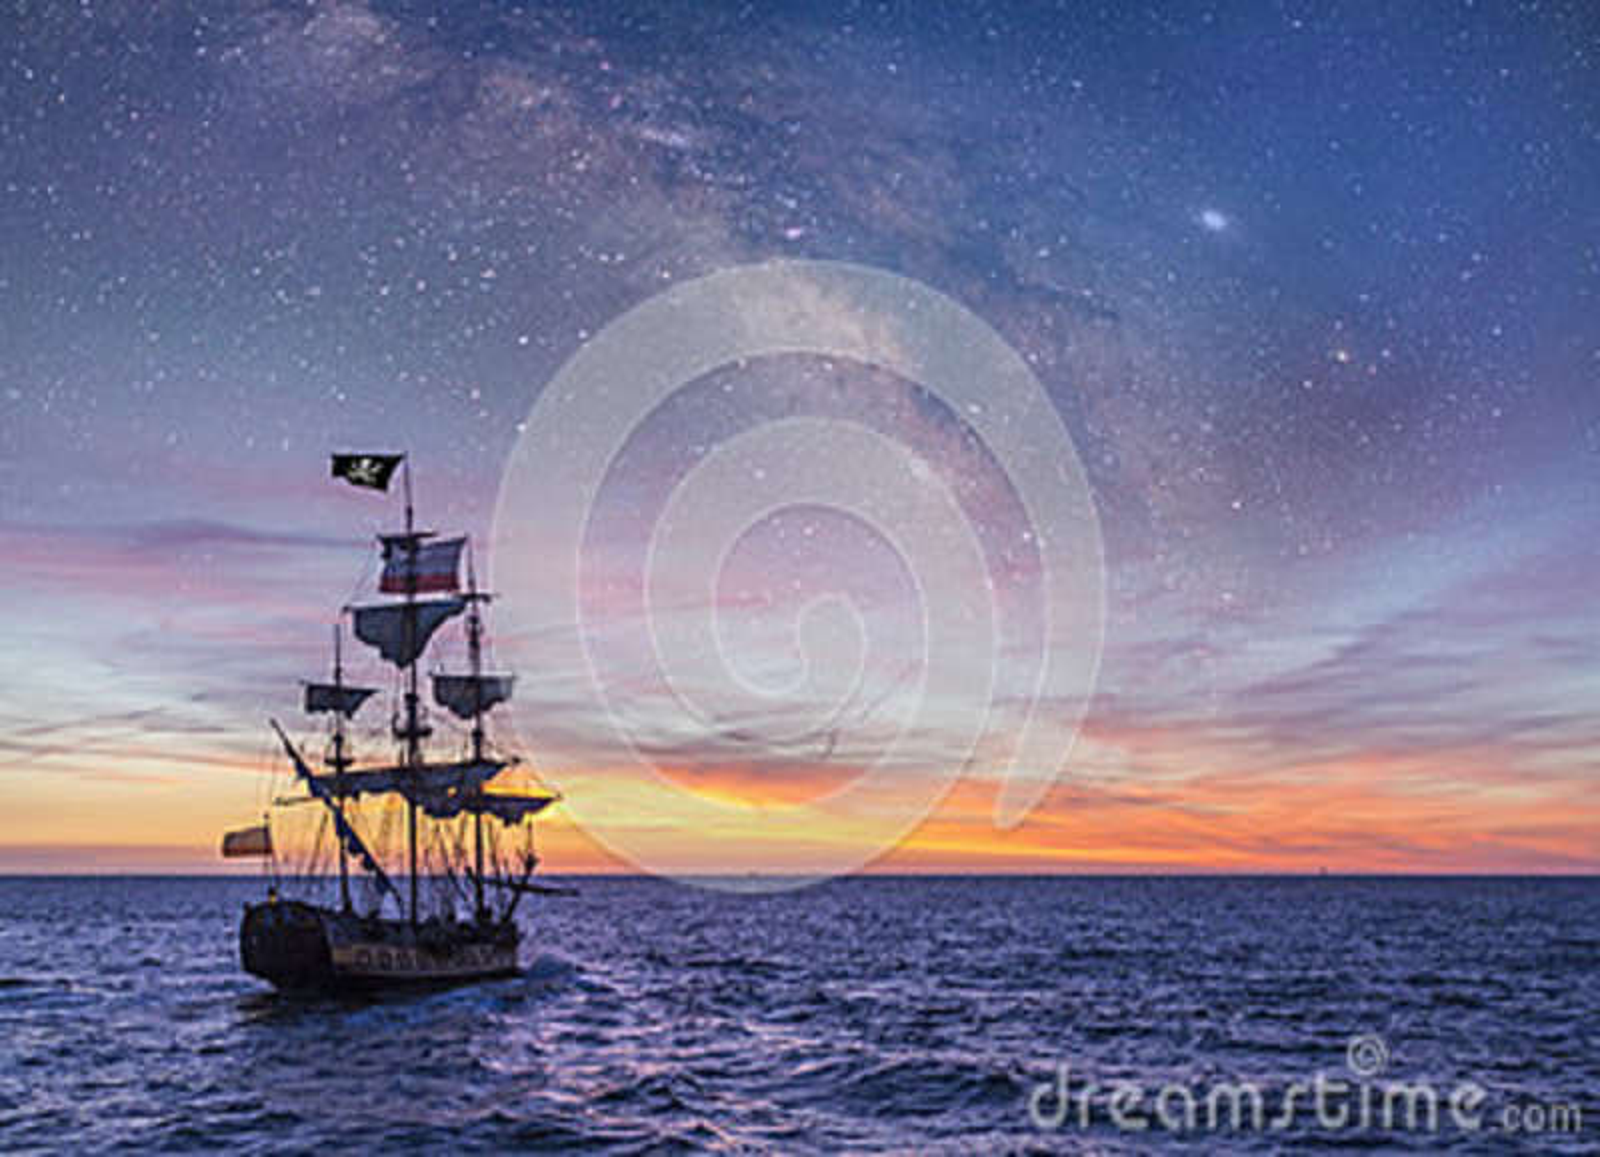 Download Pirate Ship stock image. Image of mast, dark, cruise - 89399585